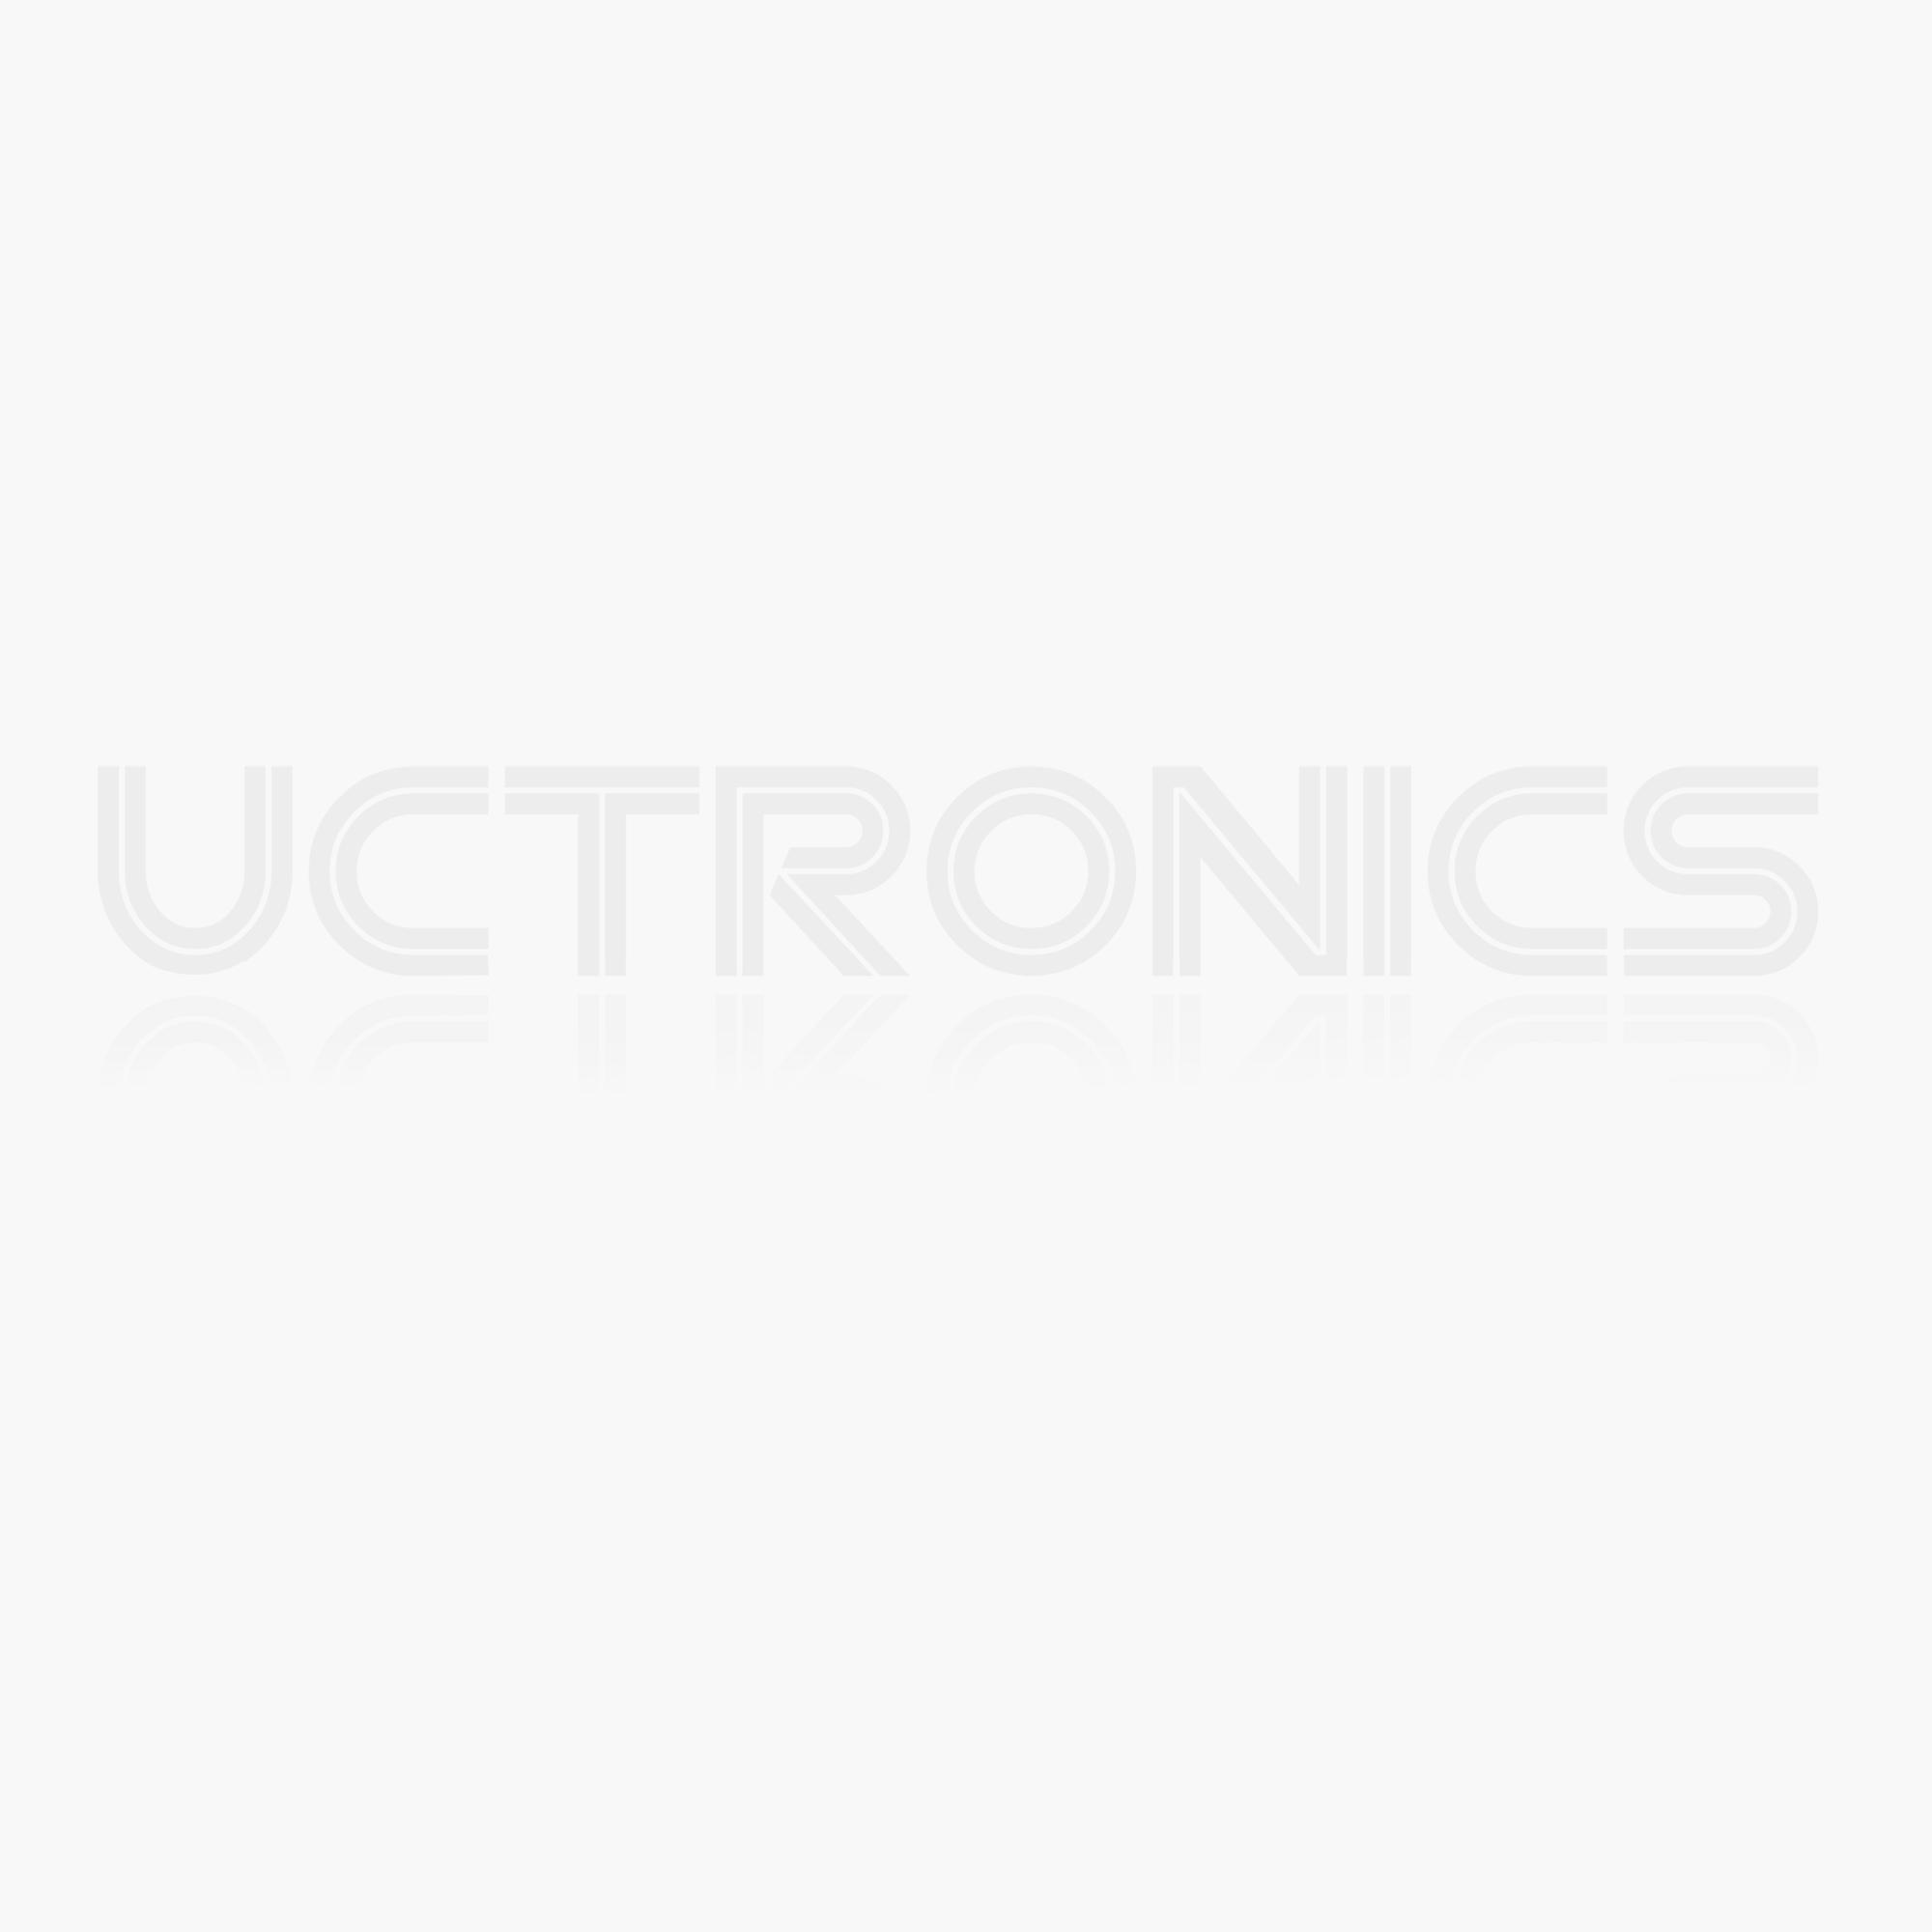 4pcs 55*26*2.4mm Transparent Toy Wheel for DIY Module